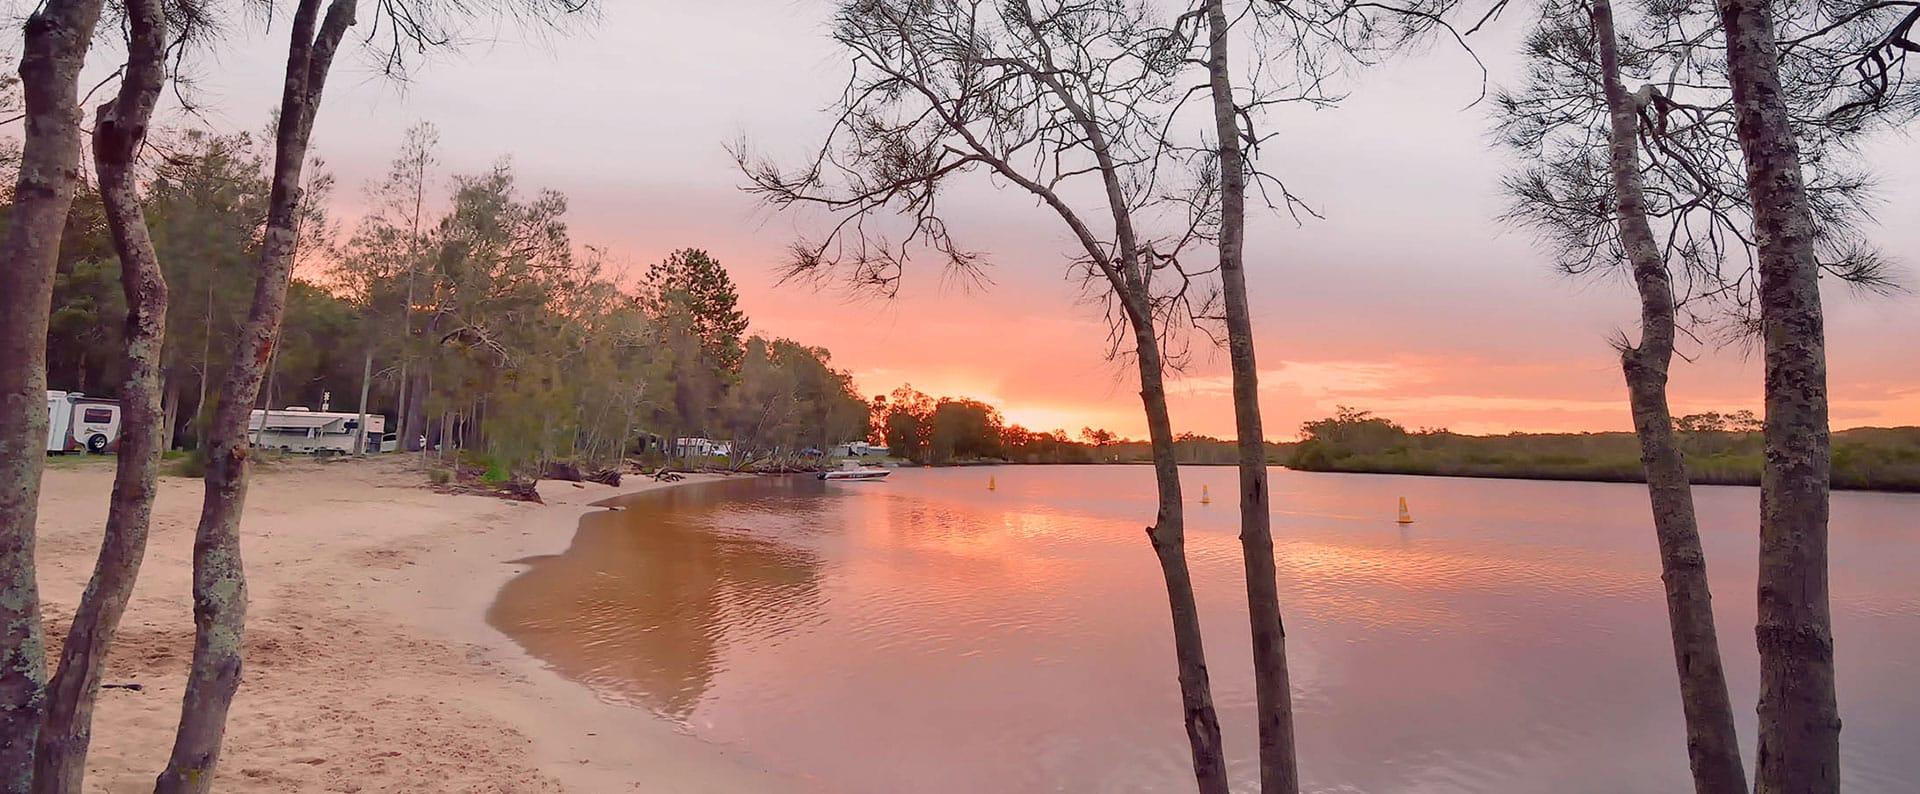 MRC-Gallery-Hero-Campground-sunset